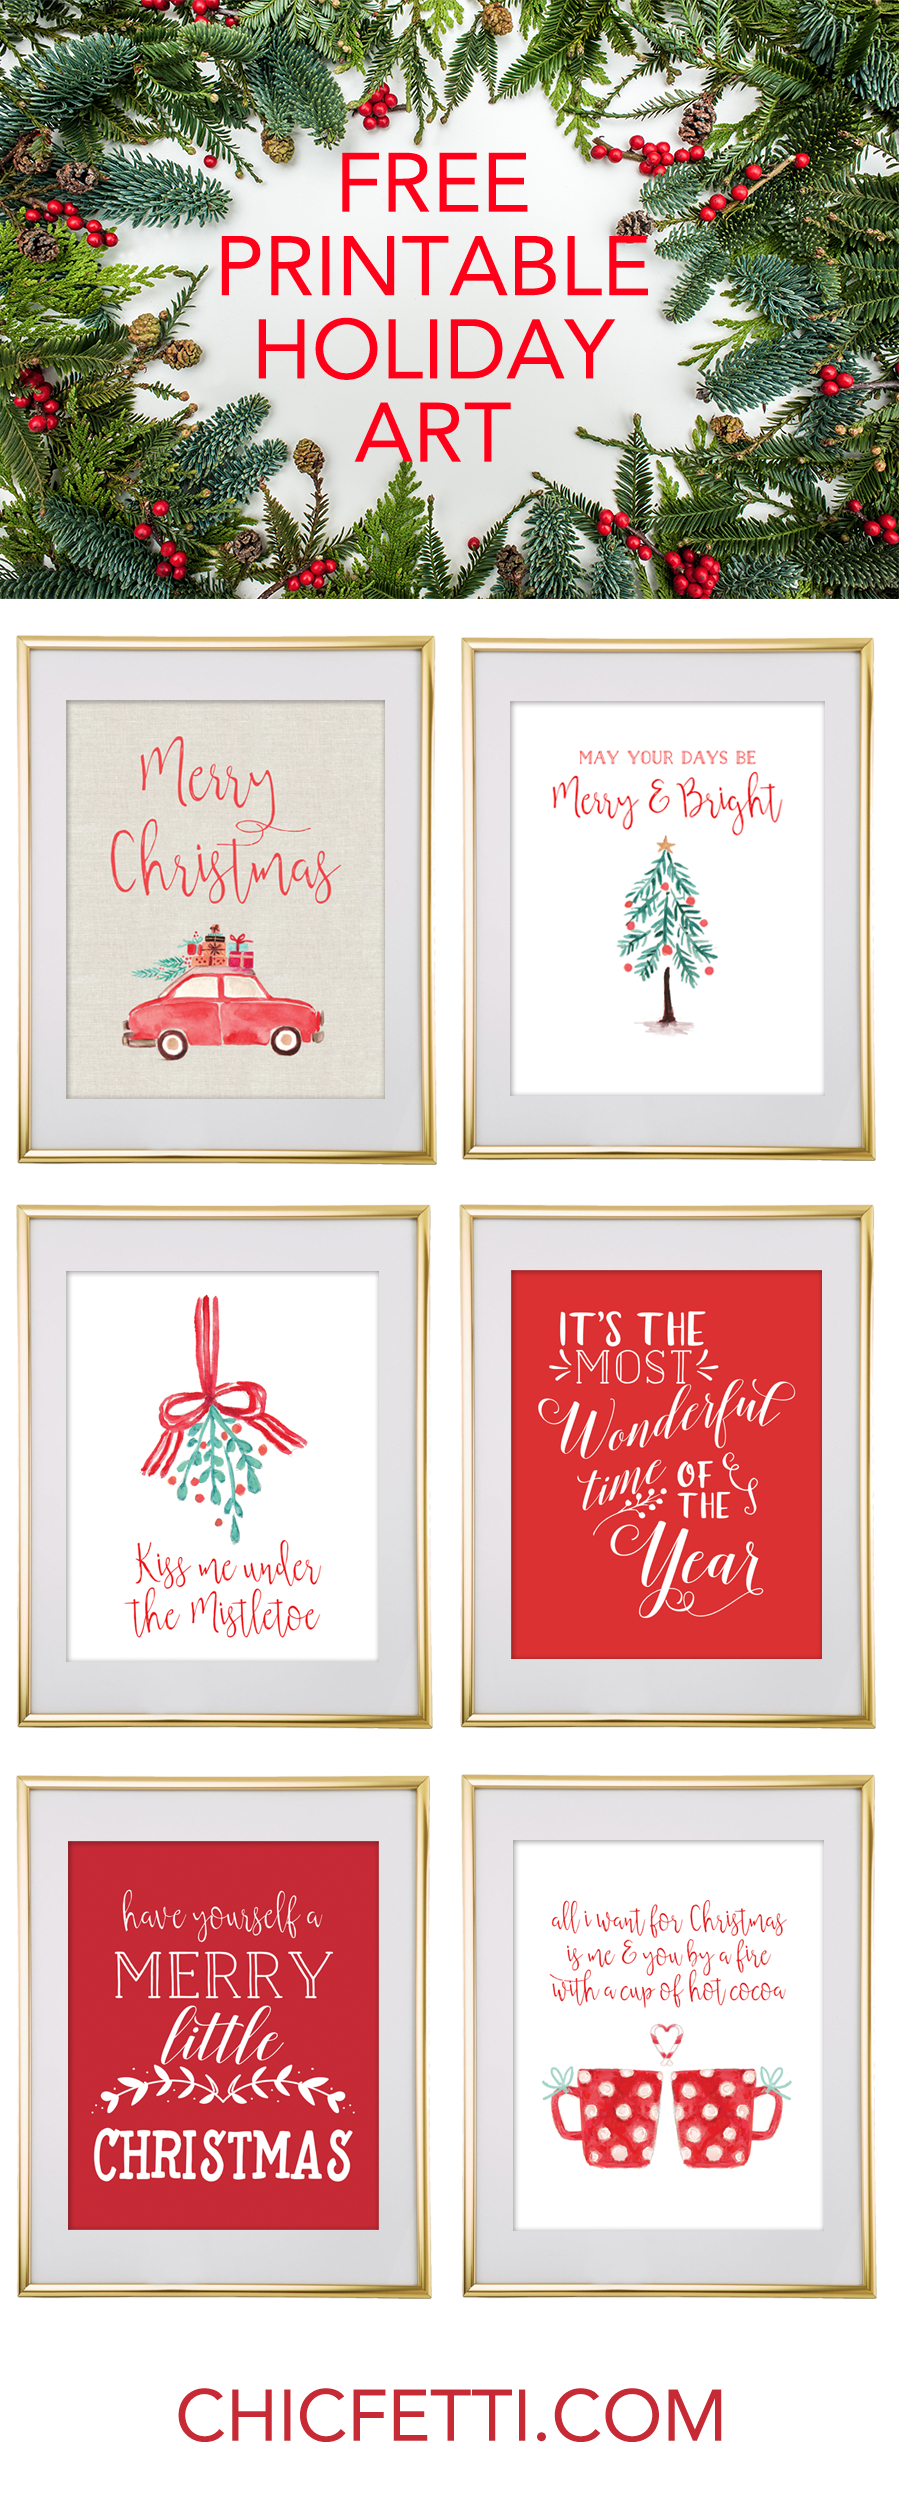 Free Printable Holiday Christmas Wall Art From @chicfetti | Free - Free Printable Christmas Decorations